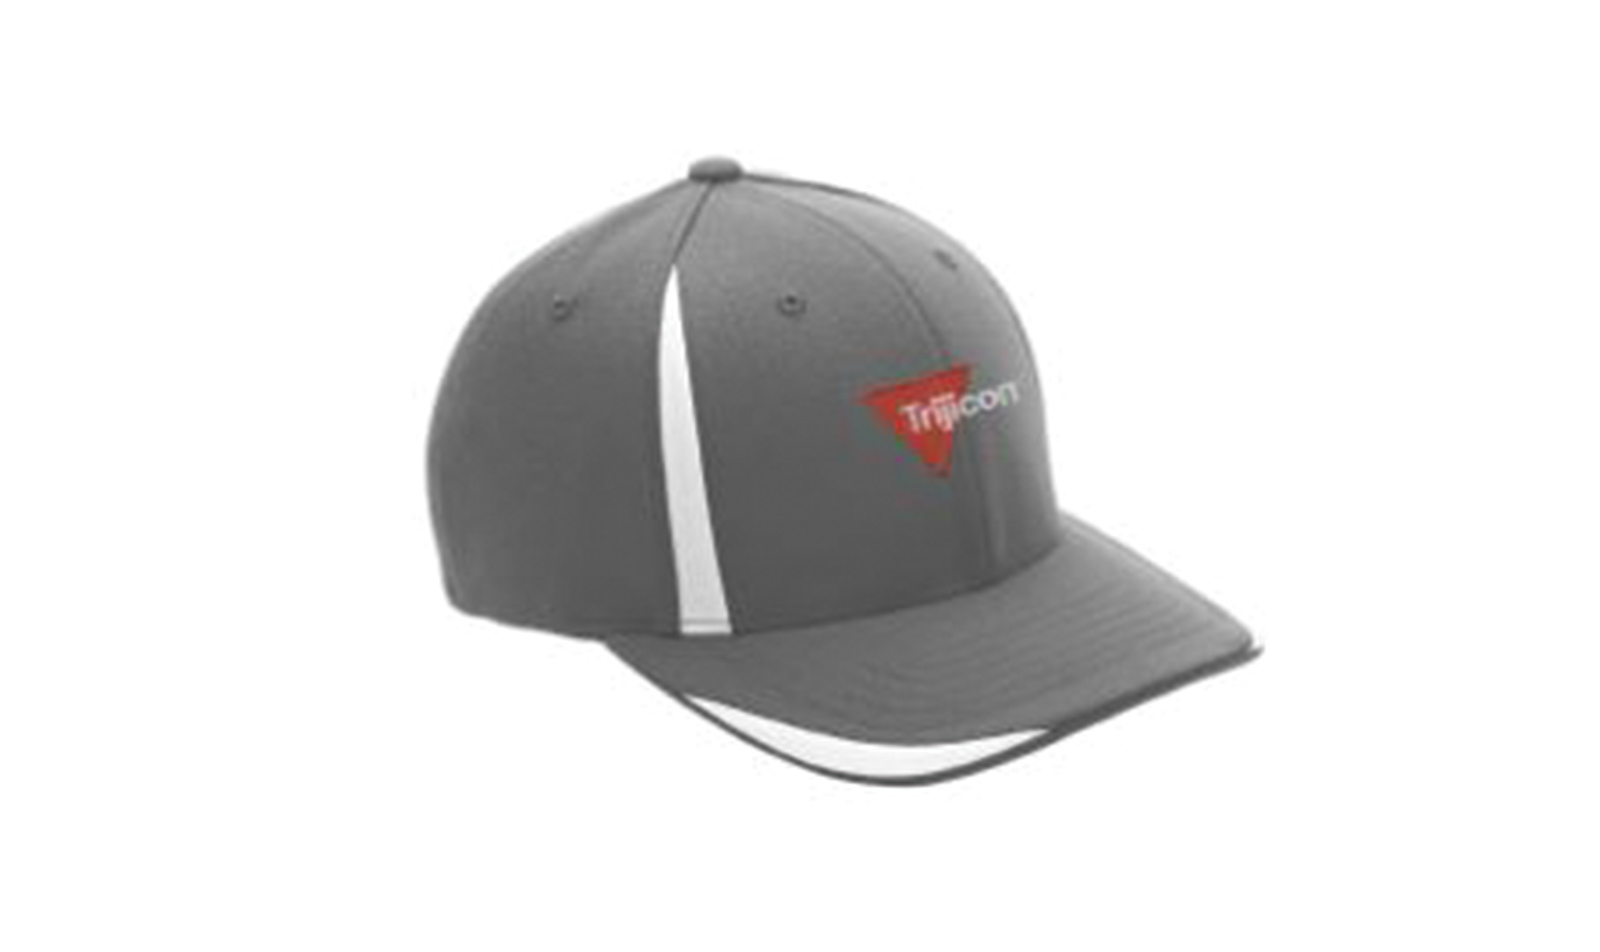 Trijicon<sup>®</sup> Flexfit Hat - Gray/White - S/M